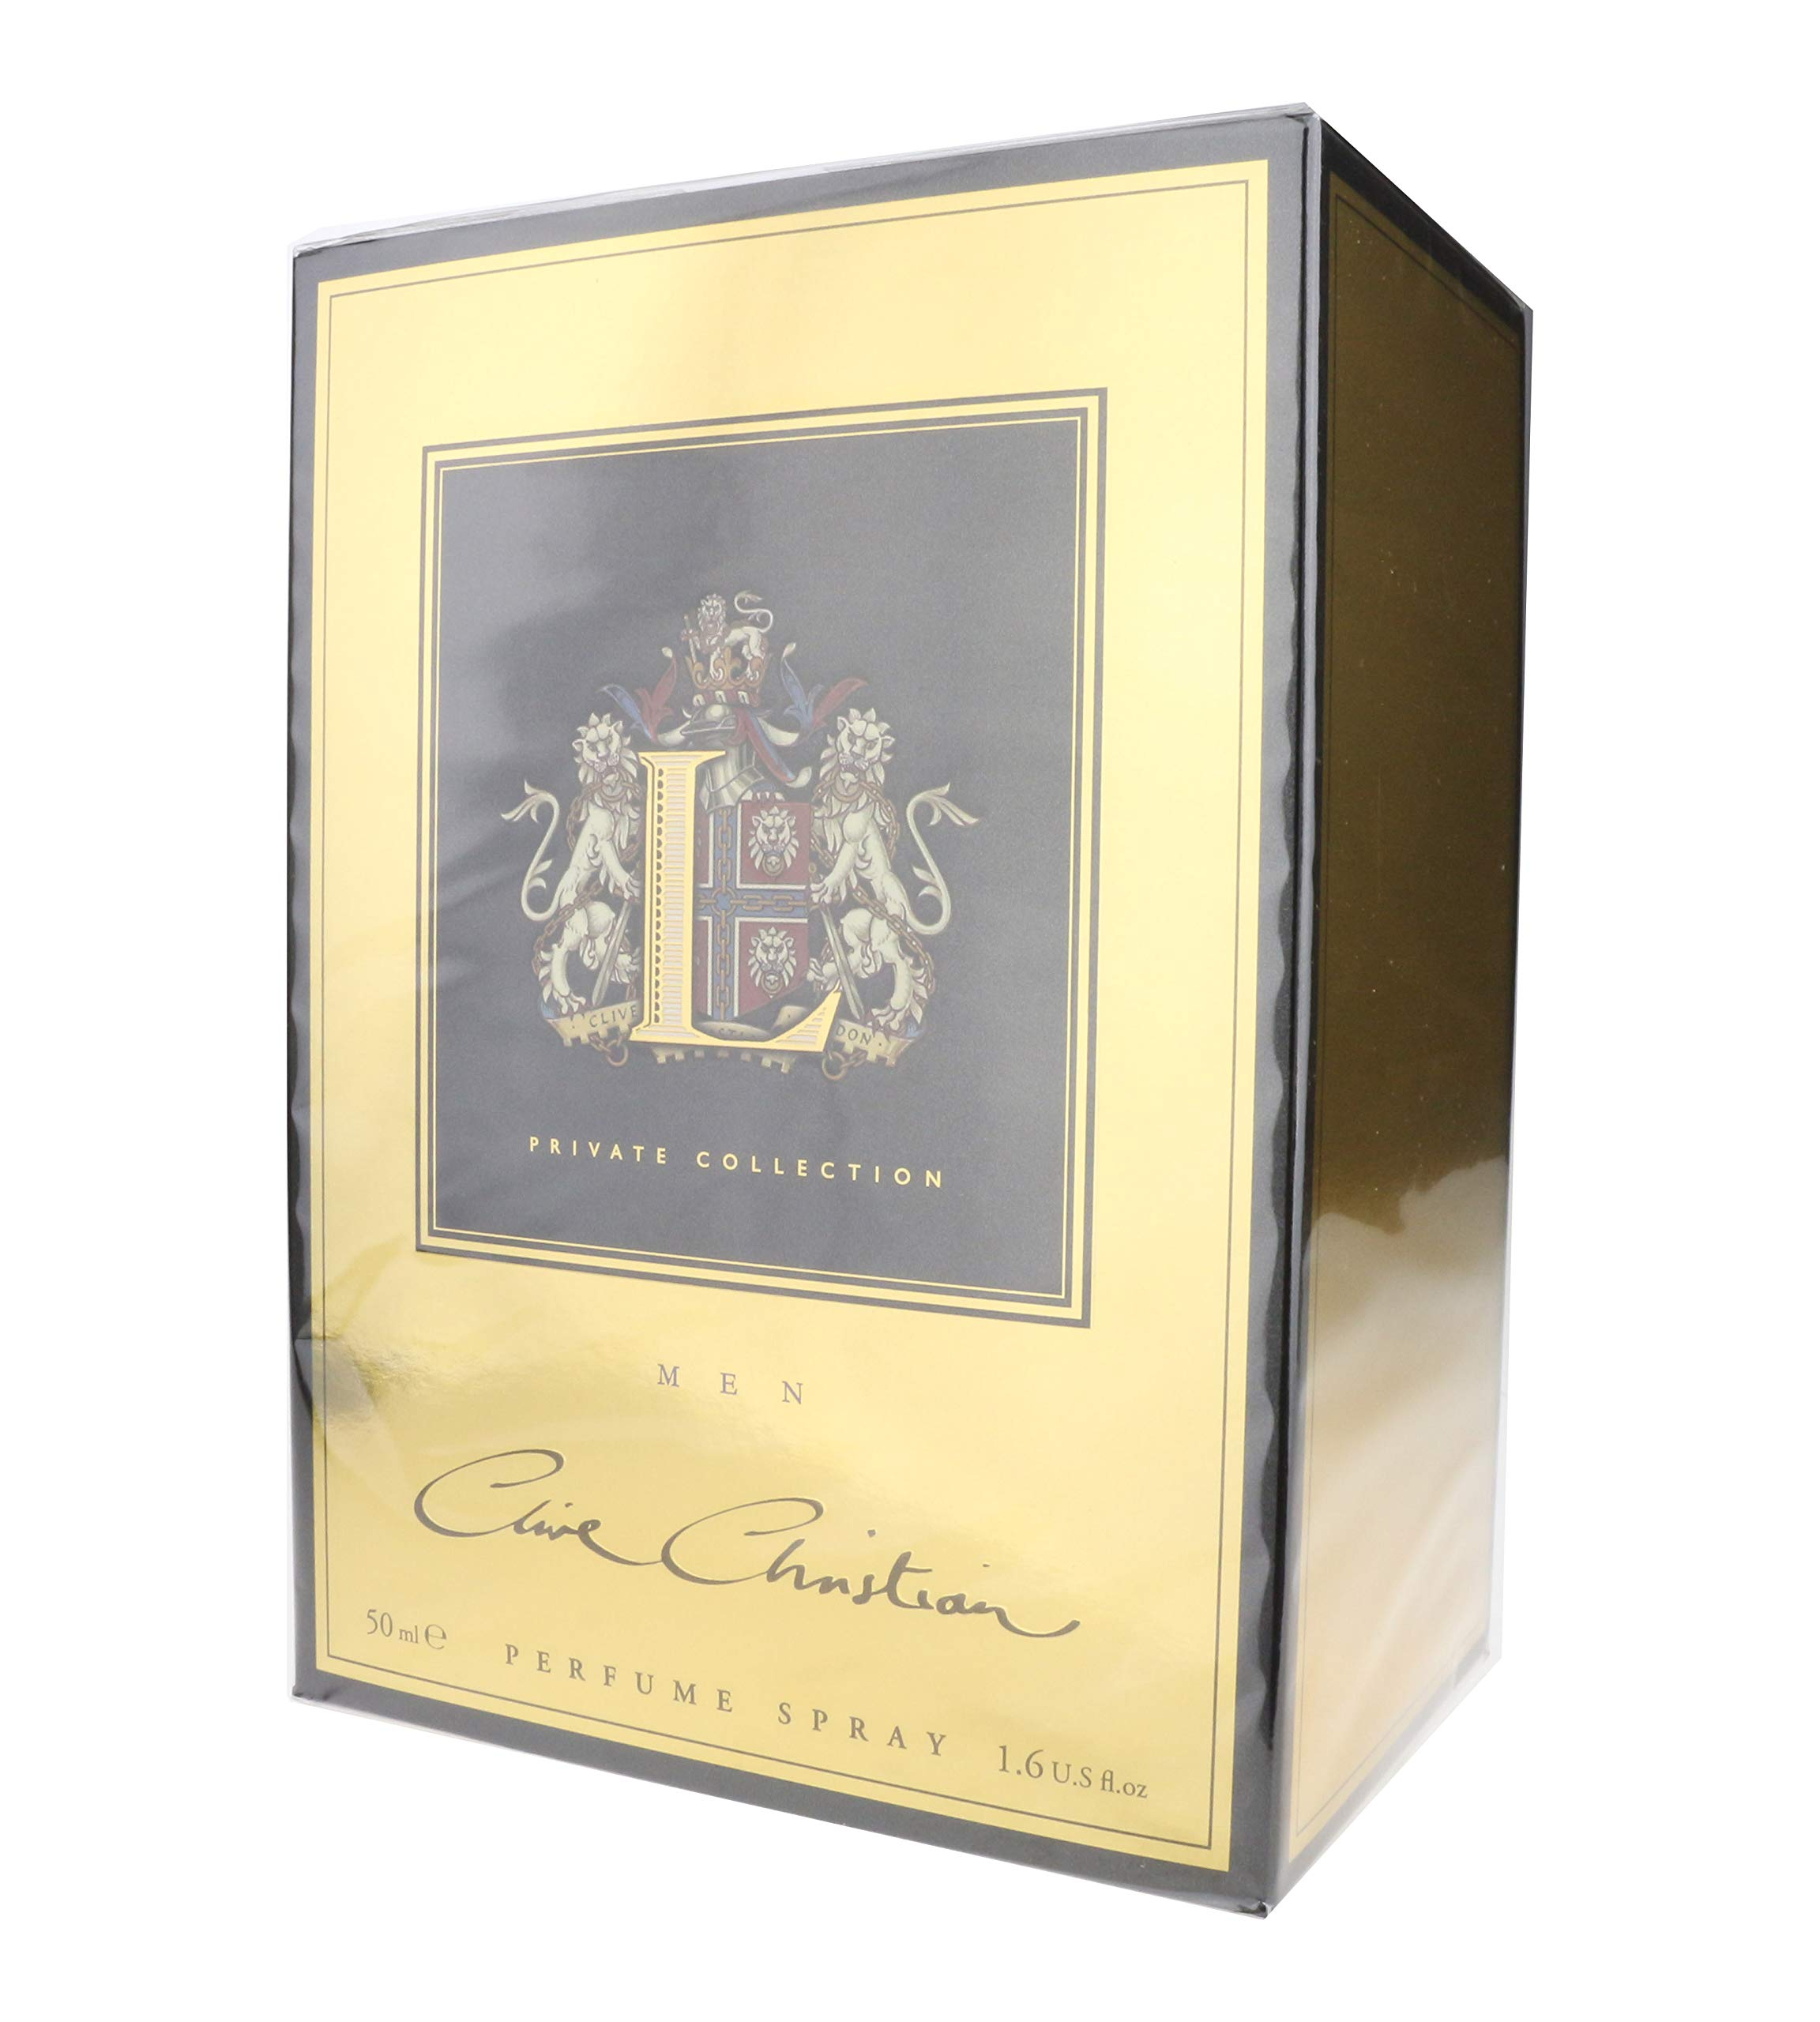 Clive Christian 'L' MEN Perfume Spray 50ml